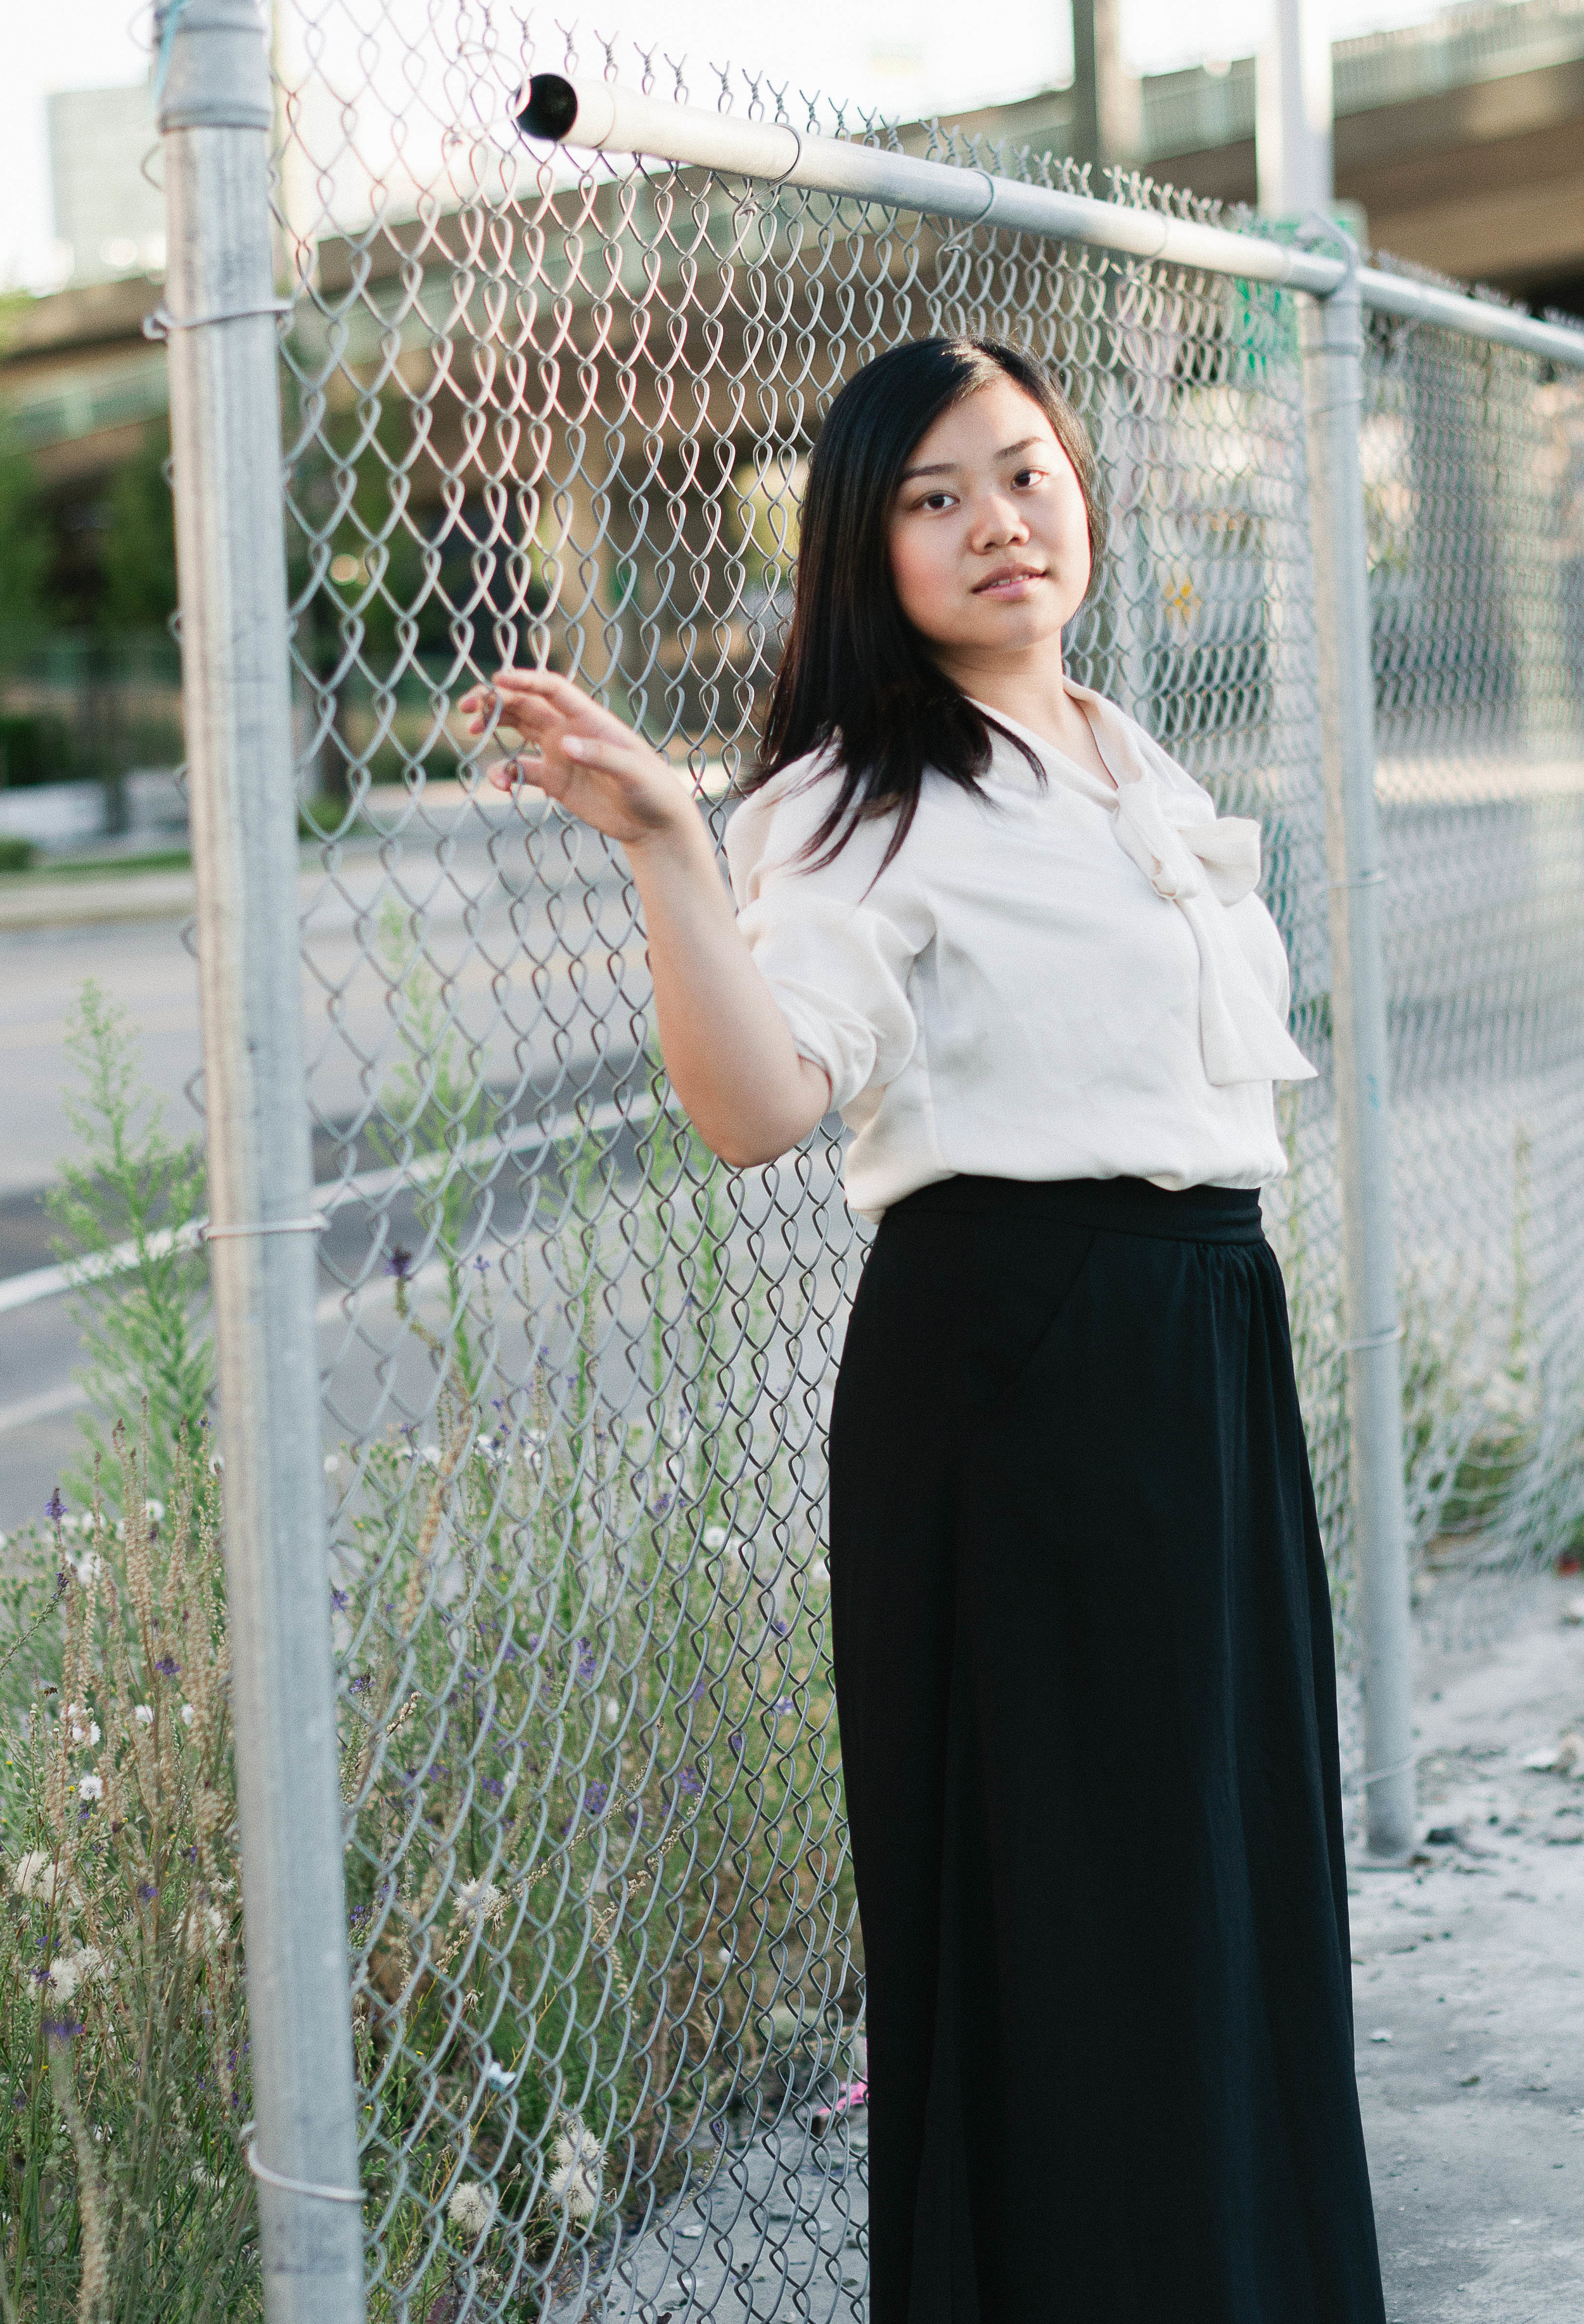 Melissa-Katie Powell Photography - Olympic Village-Portraits-Vancouver-14.jpg